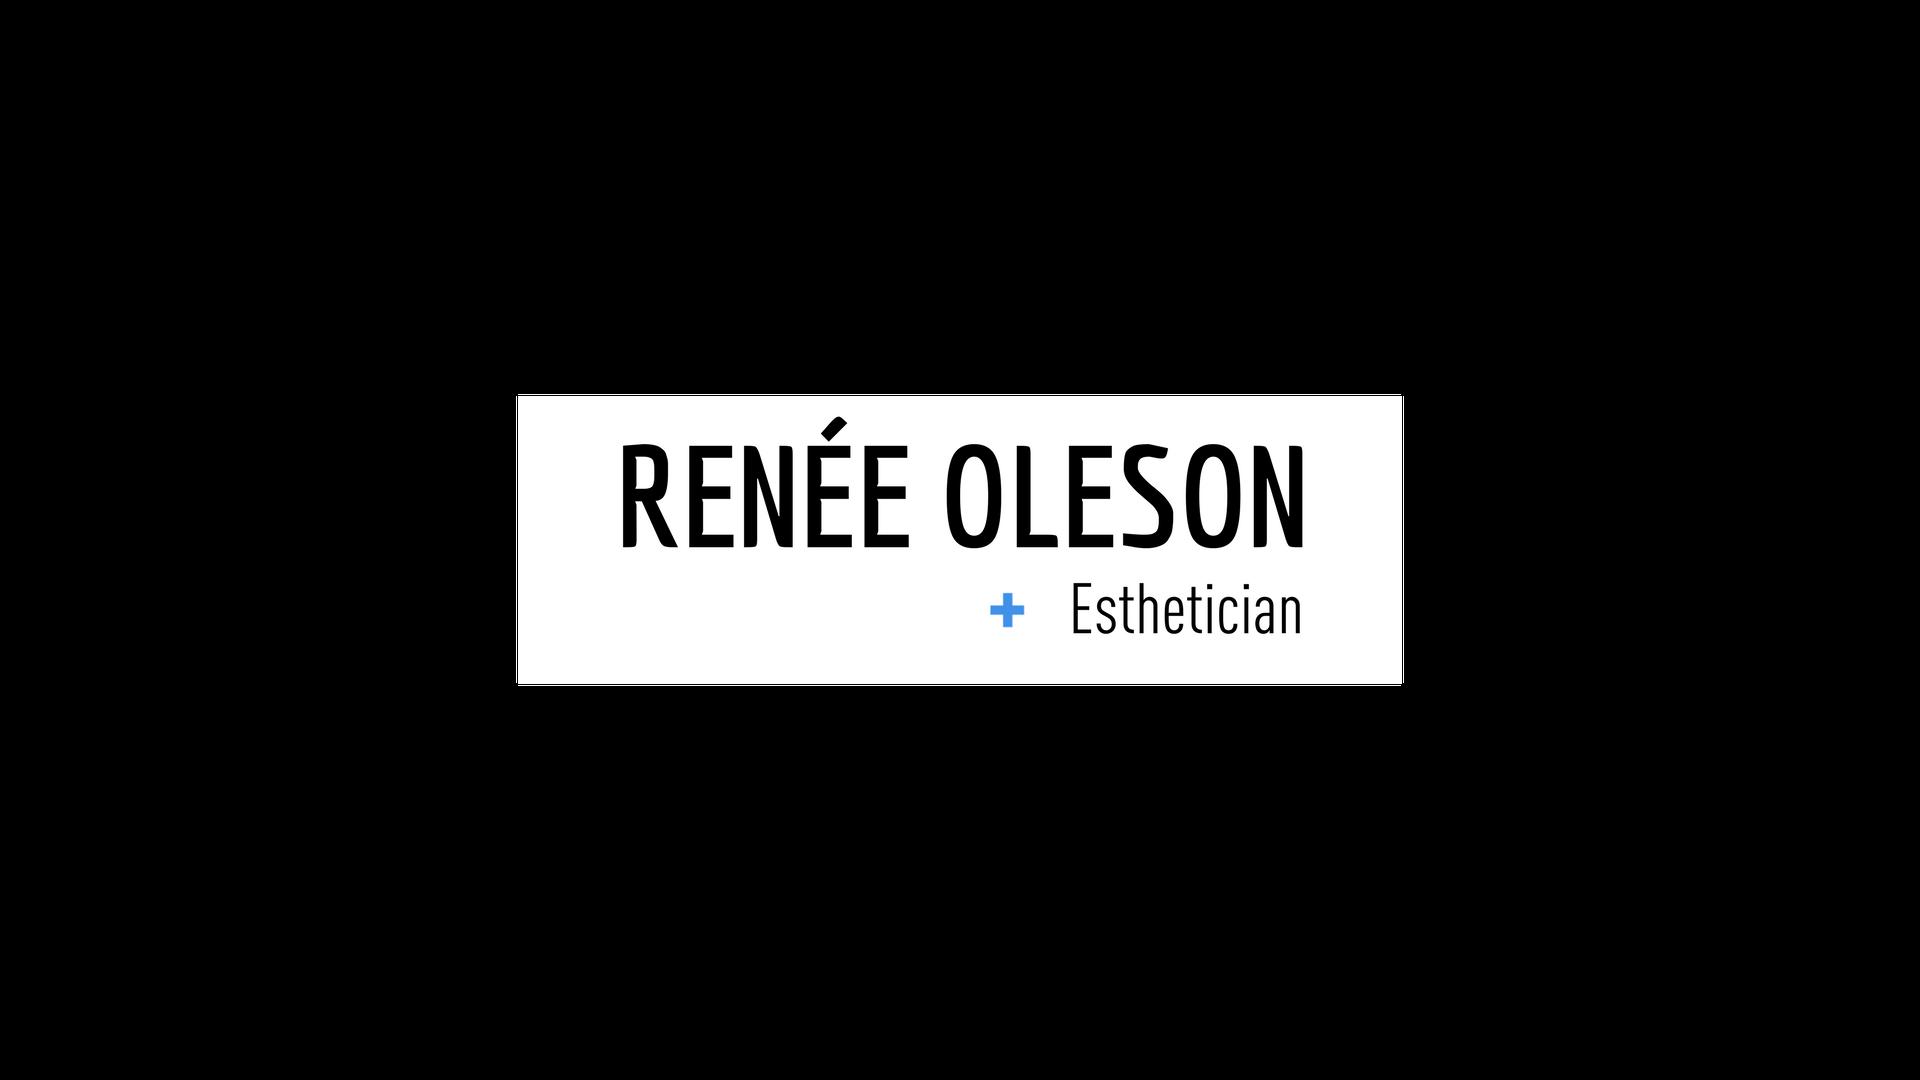 RENEE OLESON BANNER (1).png